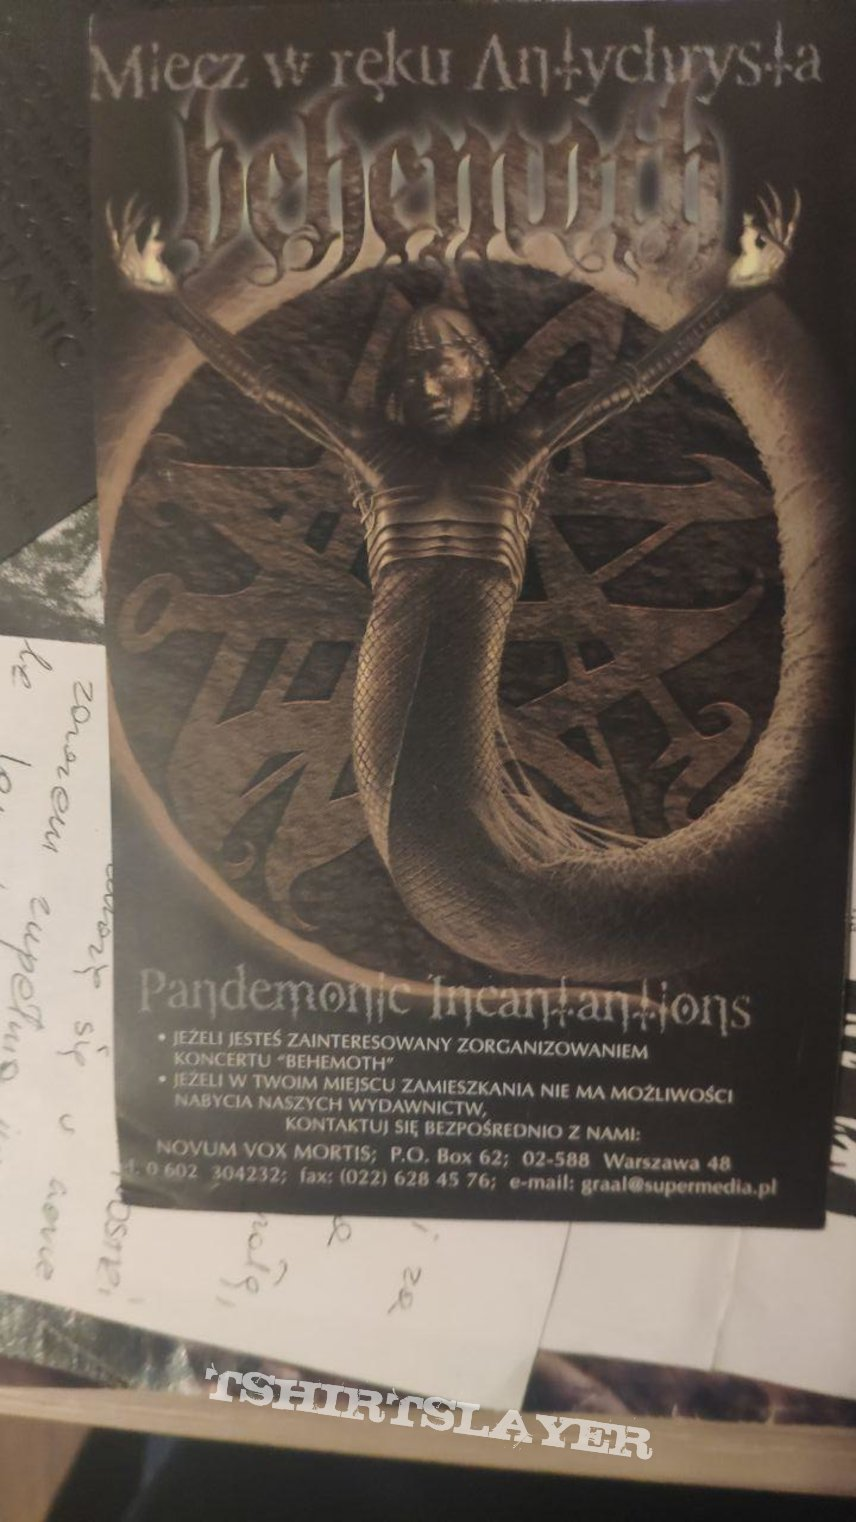 Behemoth - Pandemonic Incantations Flyer 1998 Vox Mortis